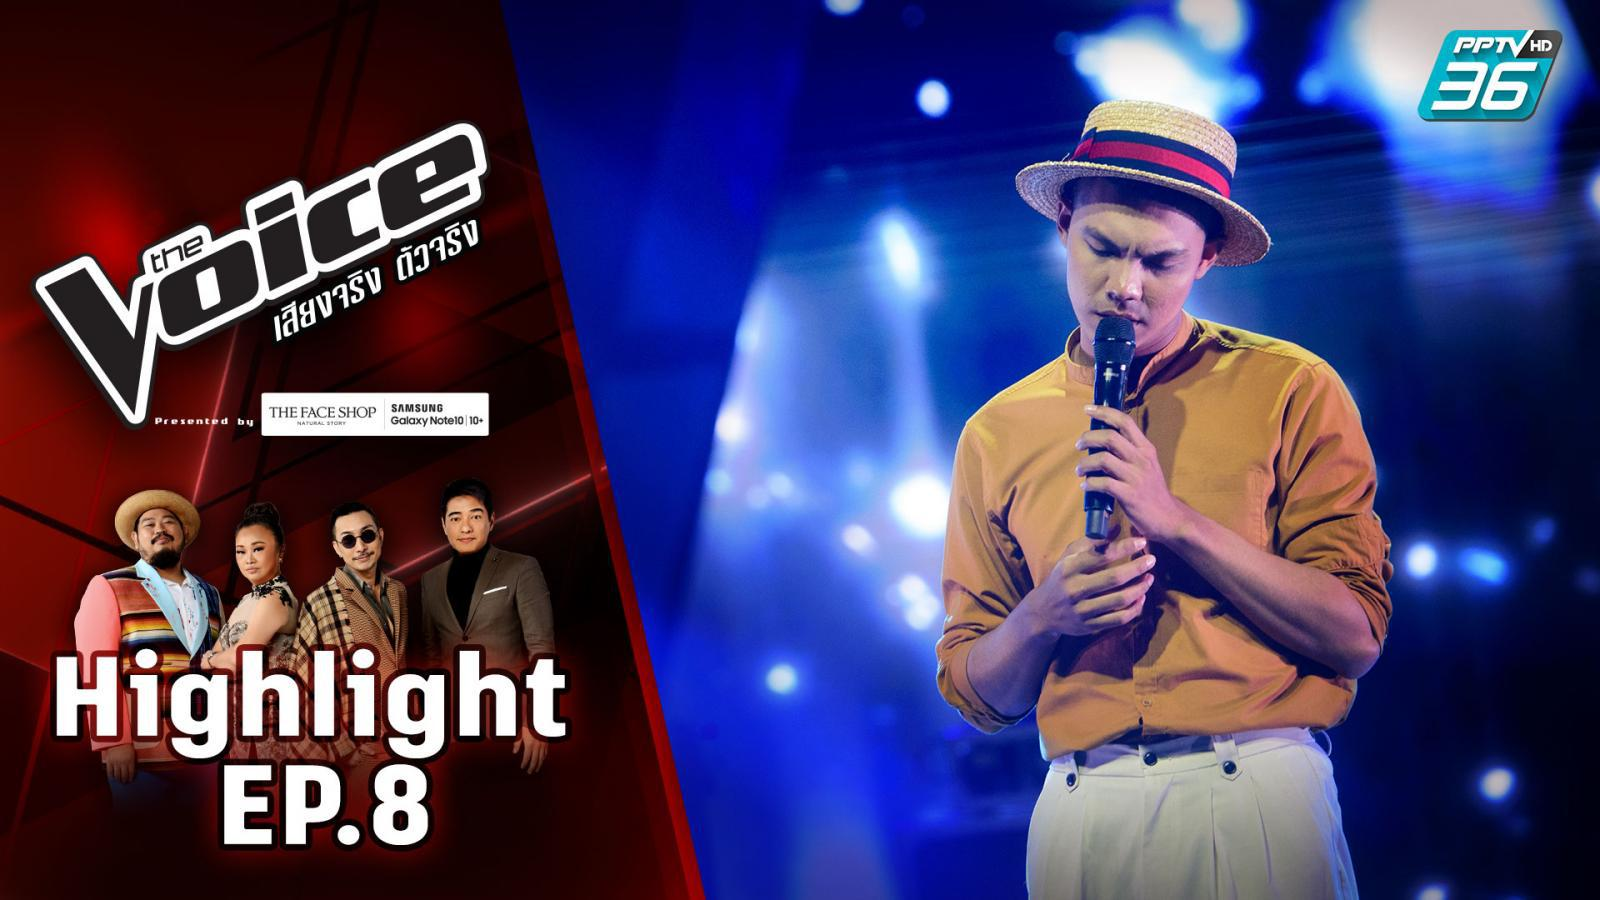 The Voice 2019 | 'กัปตัน' อารมณ์มาเต็ม กับอินเนอร์สุดเศร้า ในบทเพลงซึ้ง 'เจ้าชายนิทรา'  | Highlight EP8